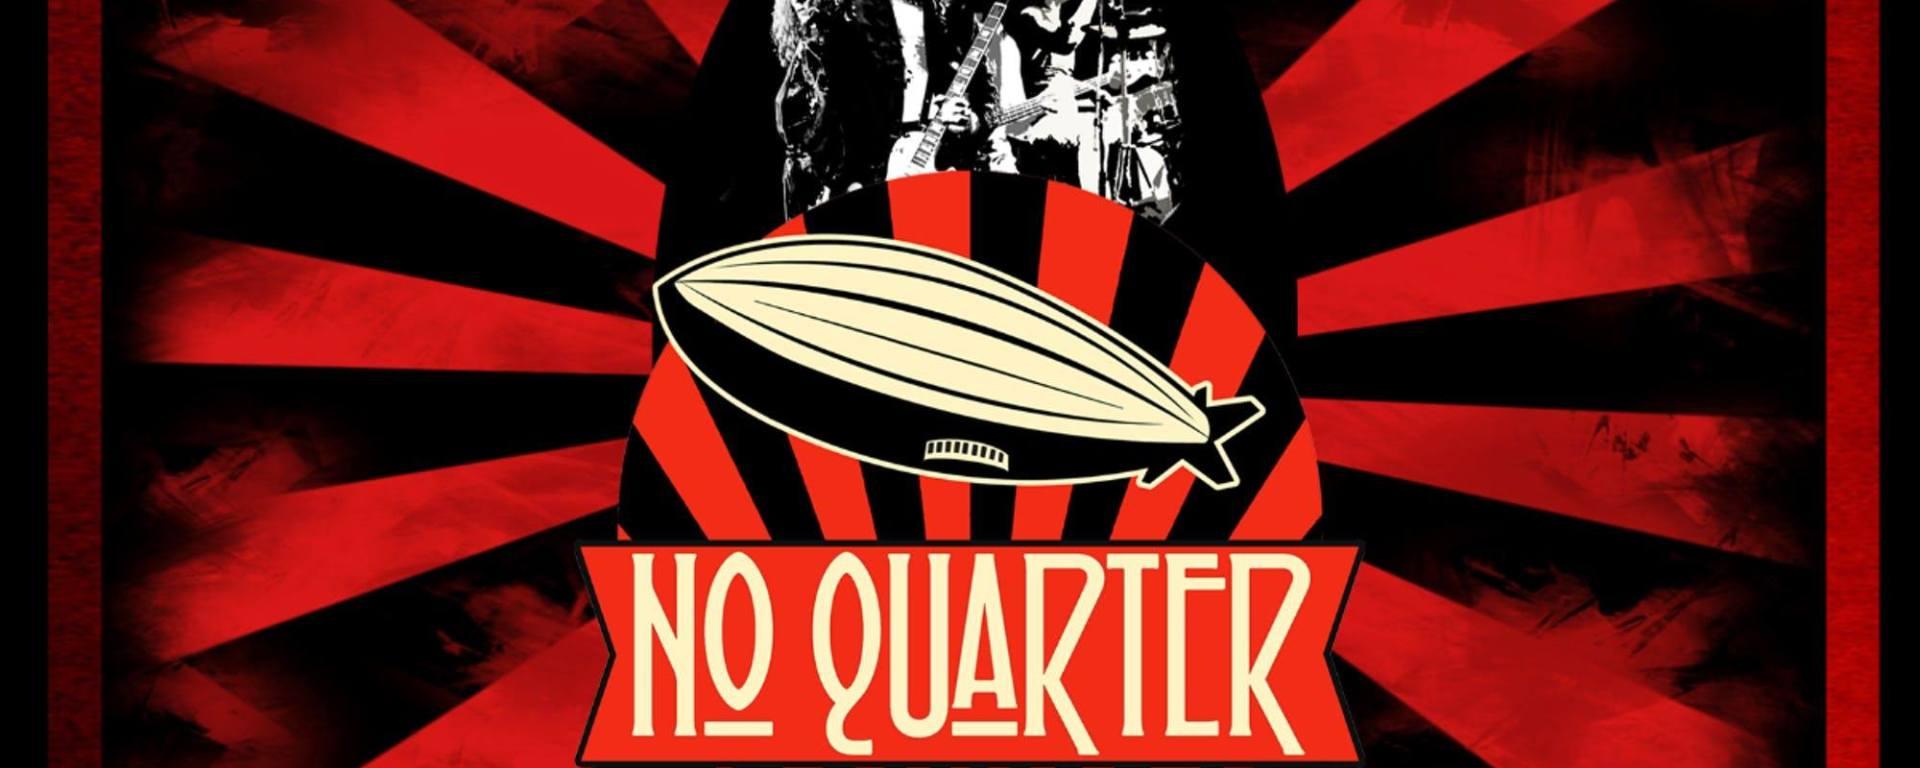 no quarter led zeppelin tribute band poster